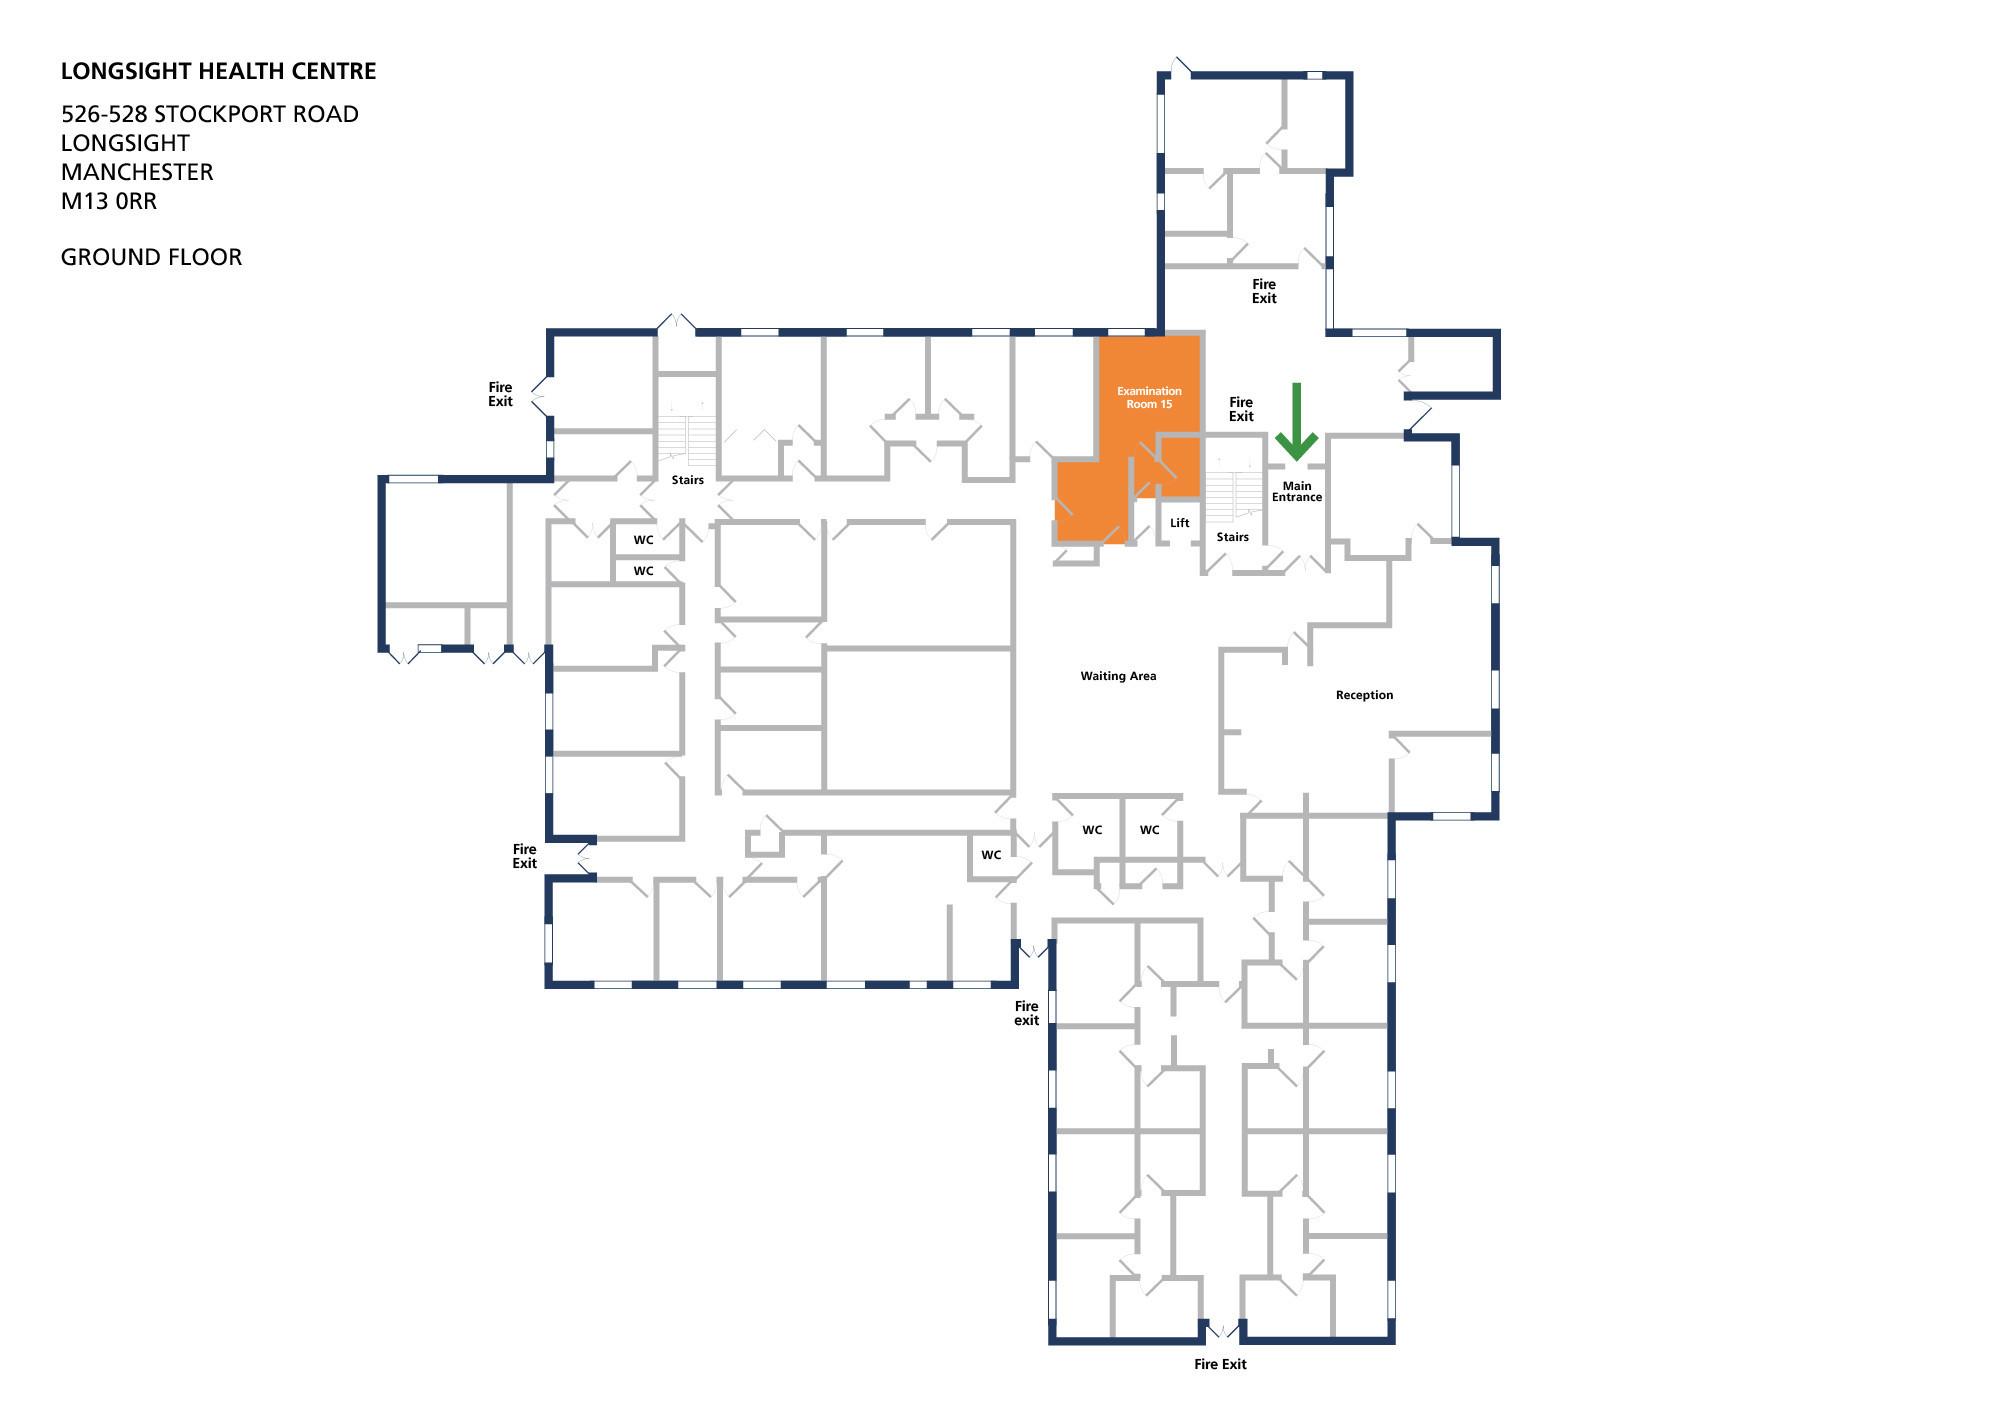 Longsight health centre room examination room 15 v1